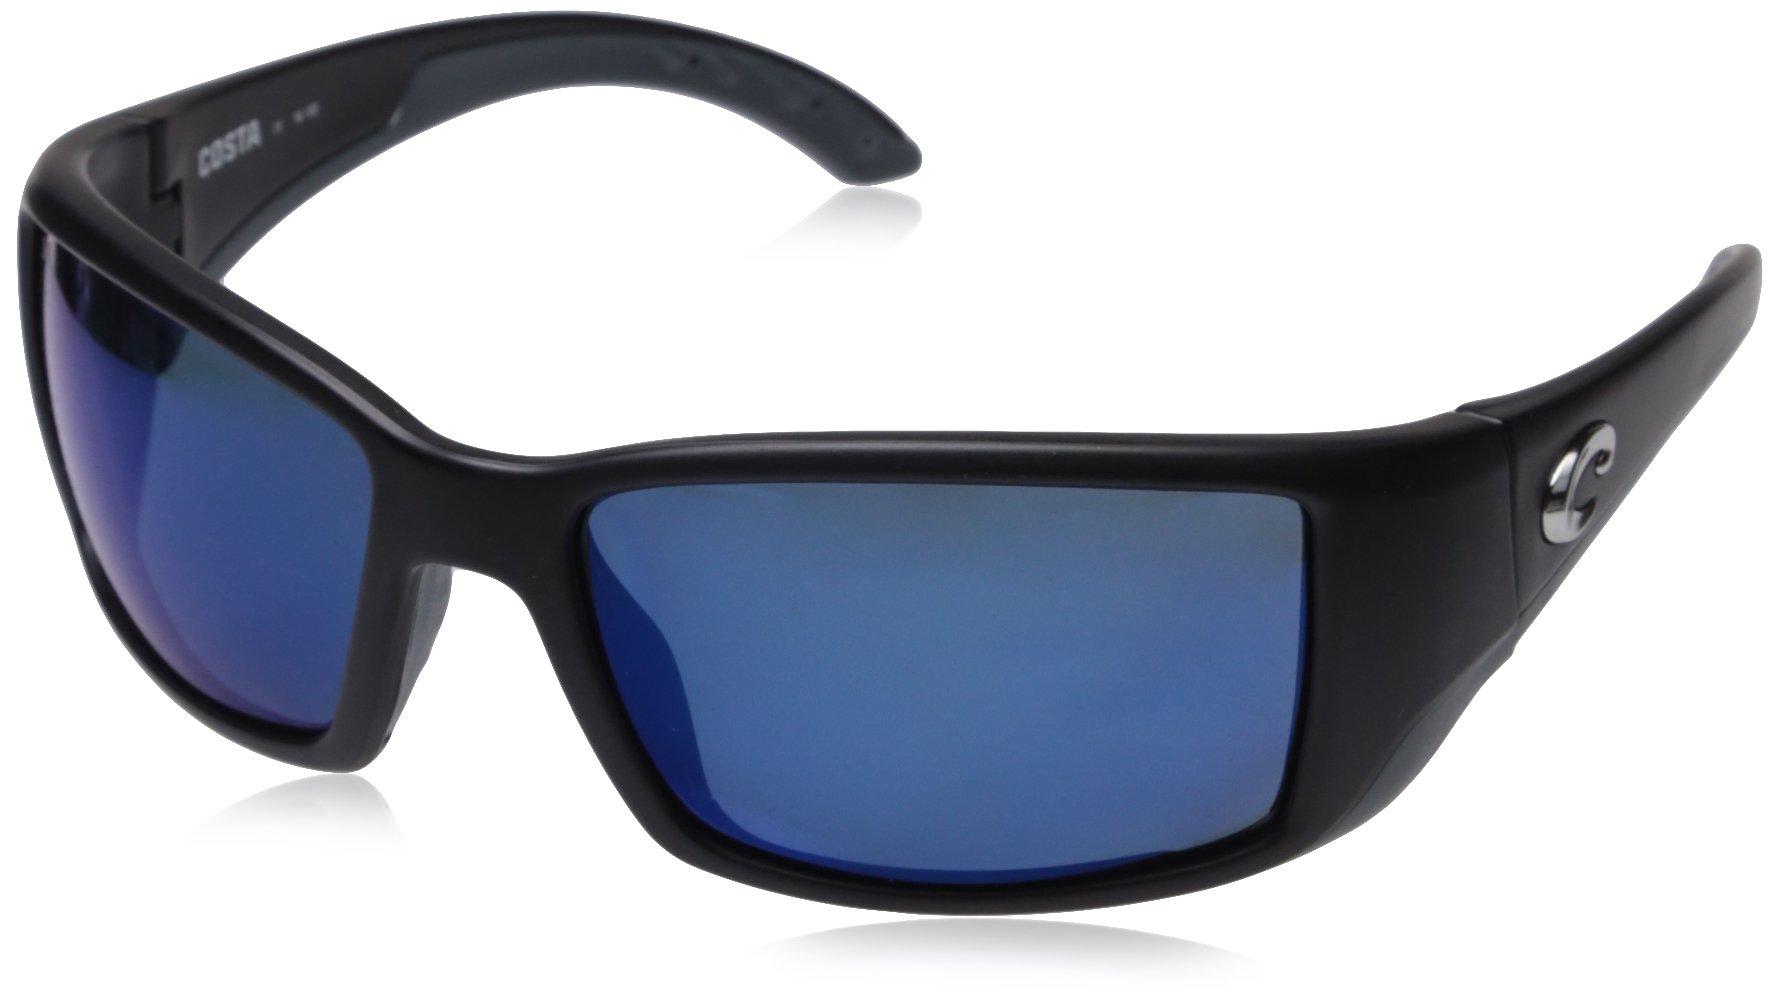 Costa Del Mar Blackfin Sunglasses, Black, Blue Mirror 580 Plastic Lens by Costa Del Mar